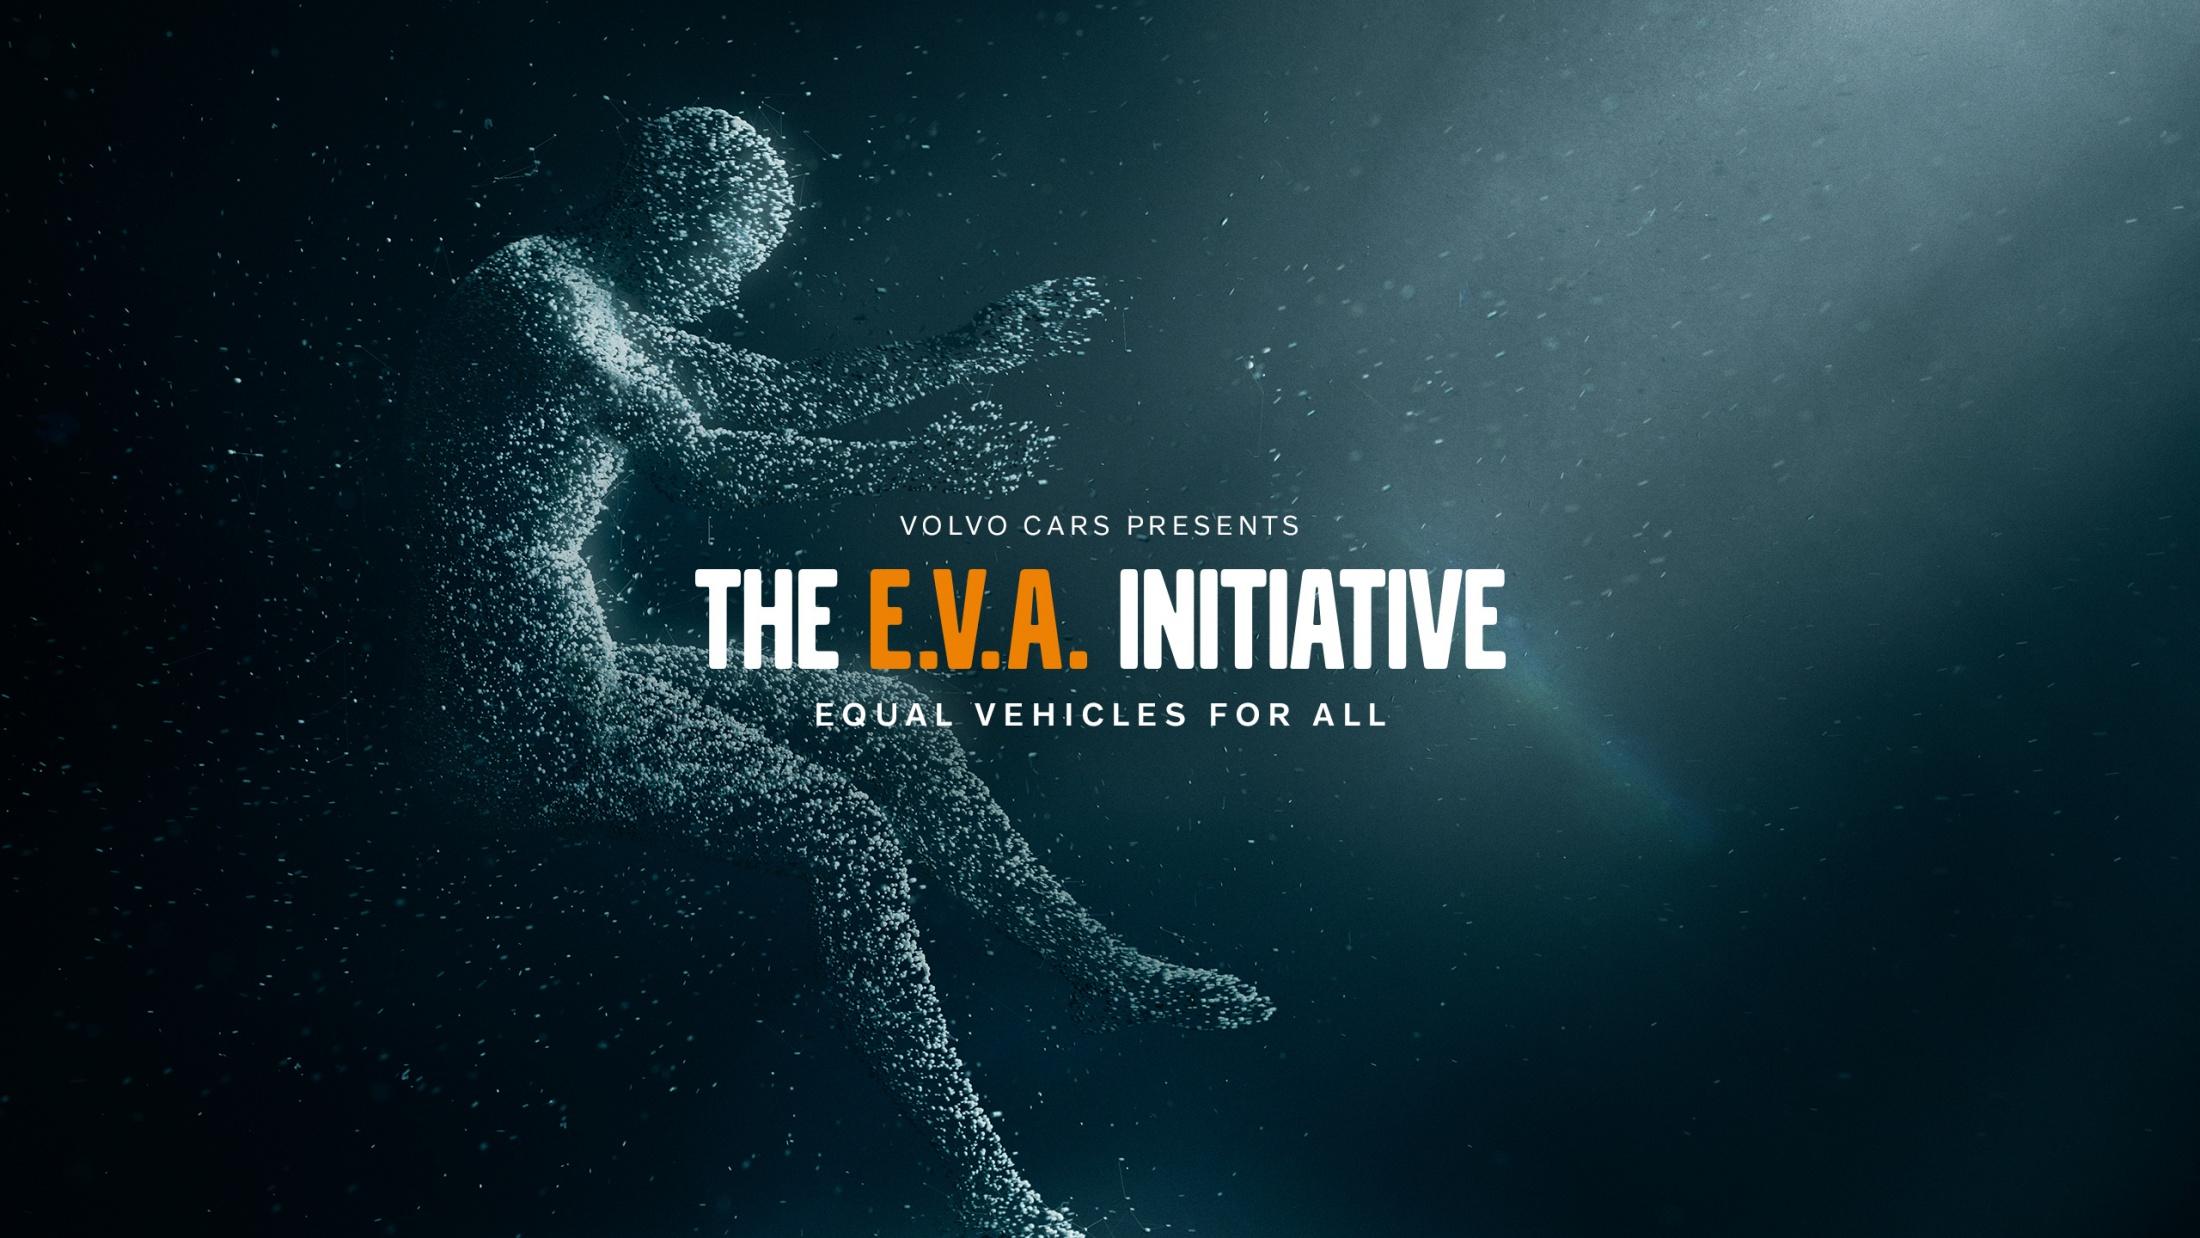 Thumbnail for The E.V.A. Initiative